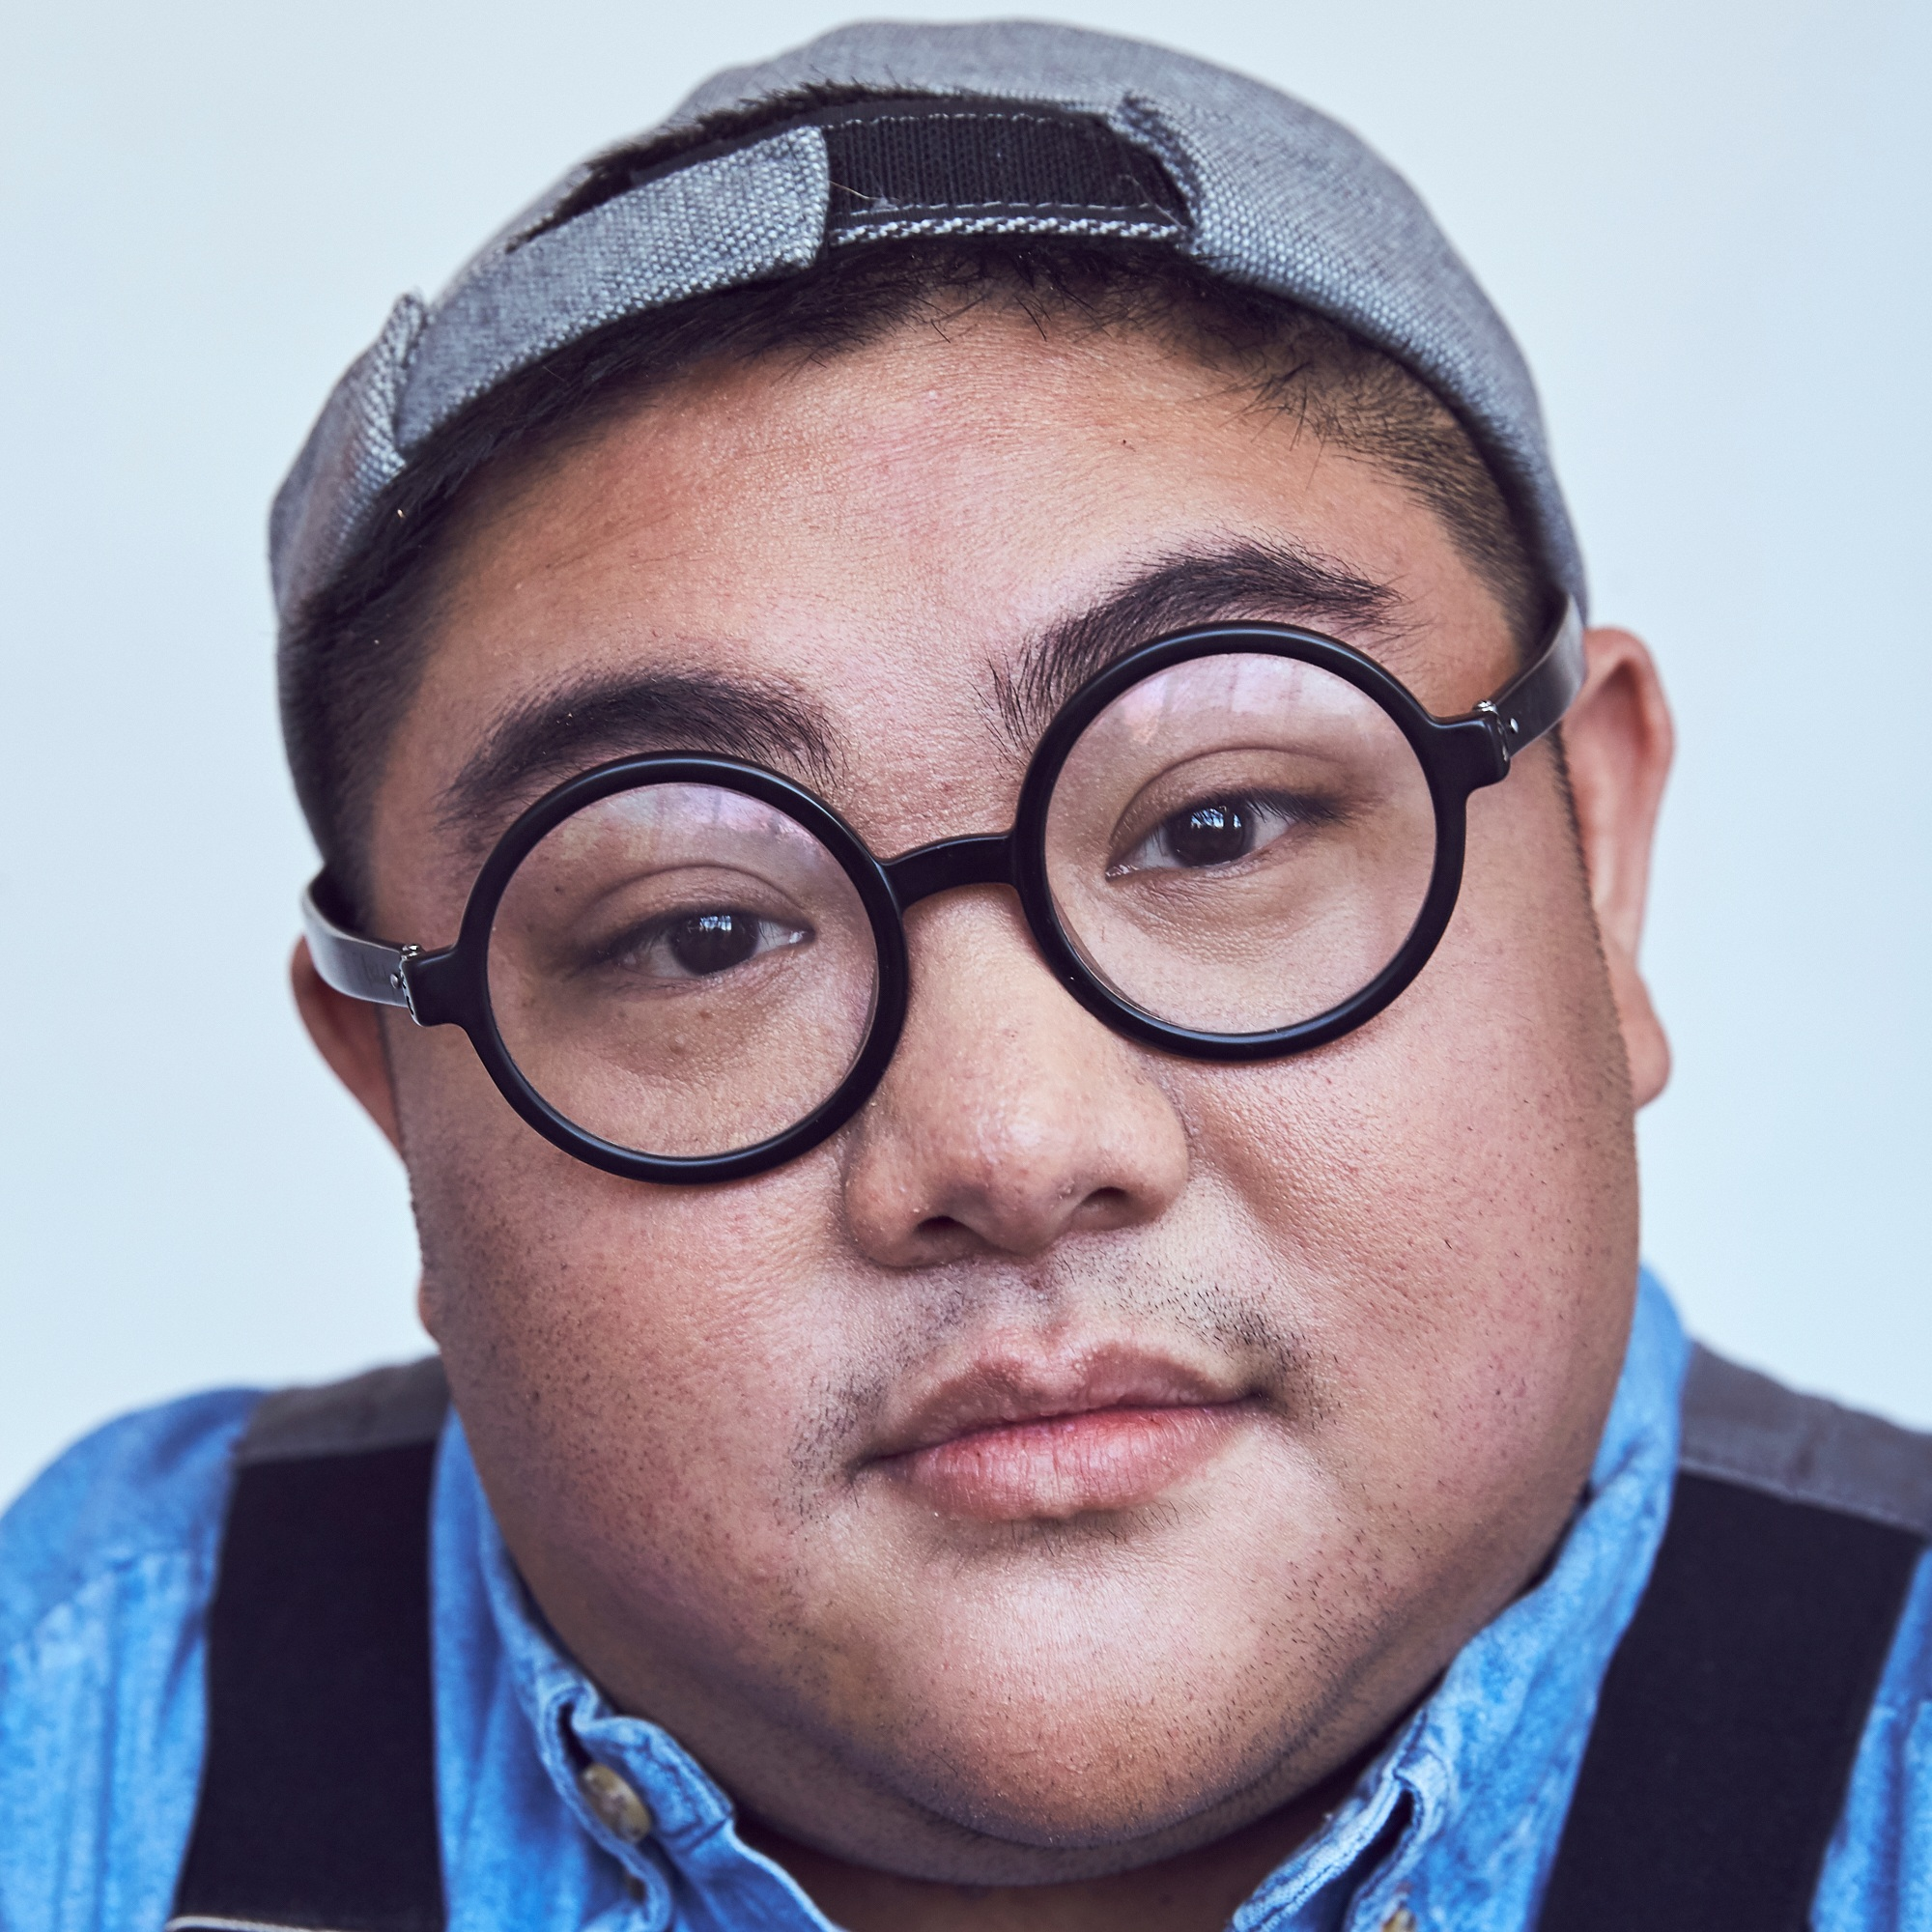 HIEU MINH NGUYEN -